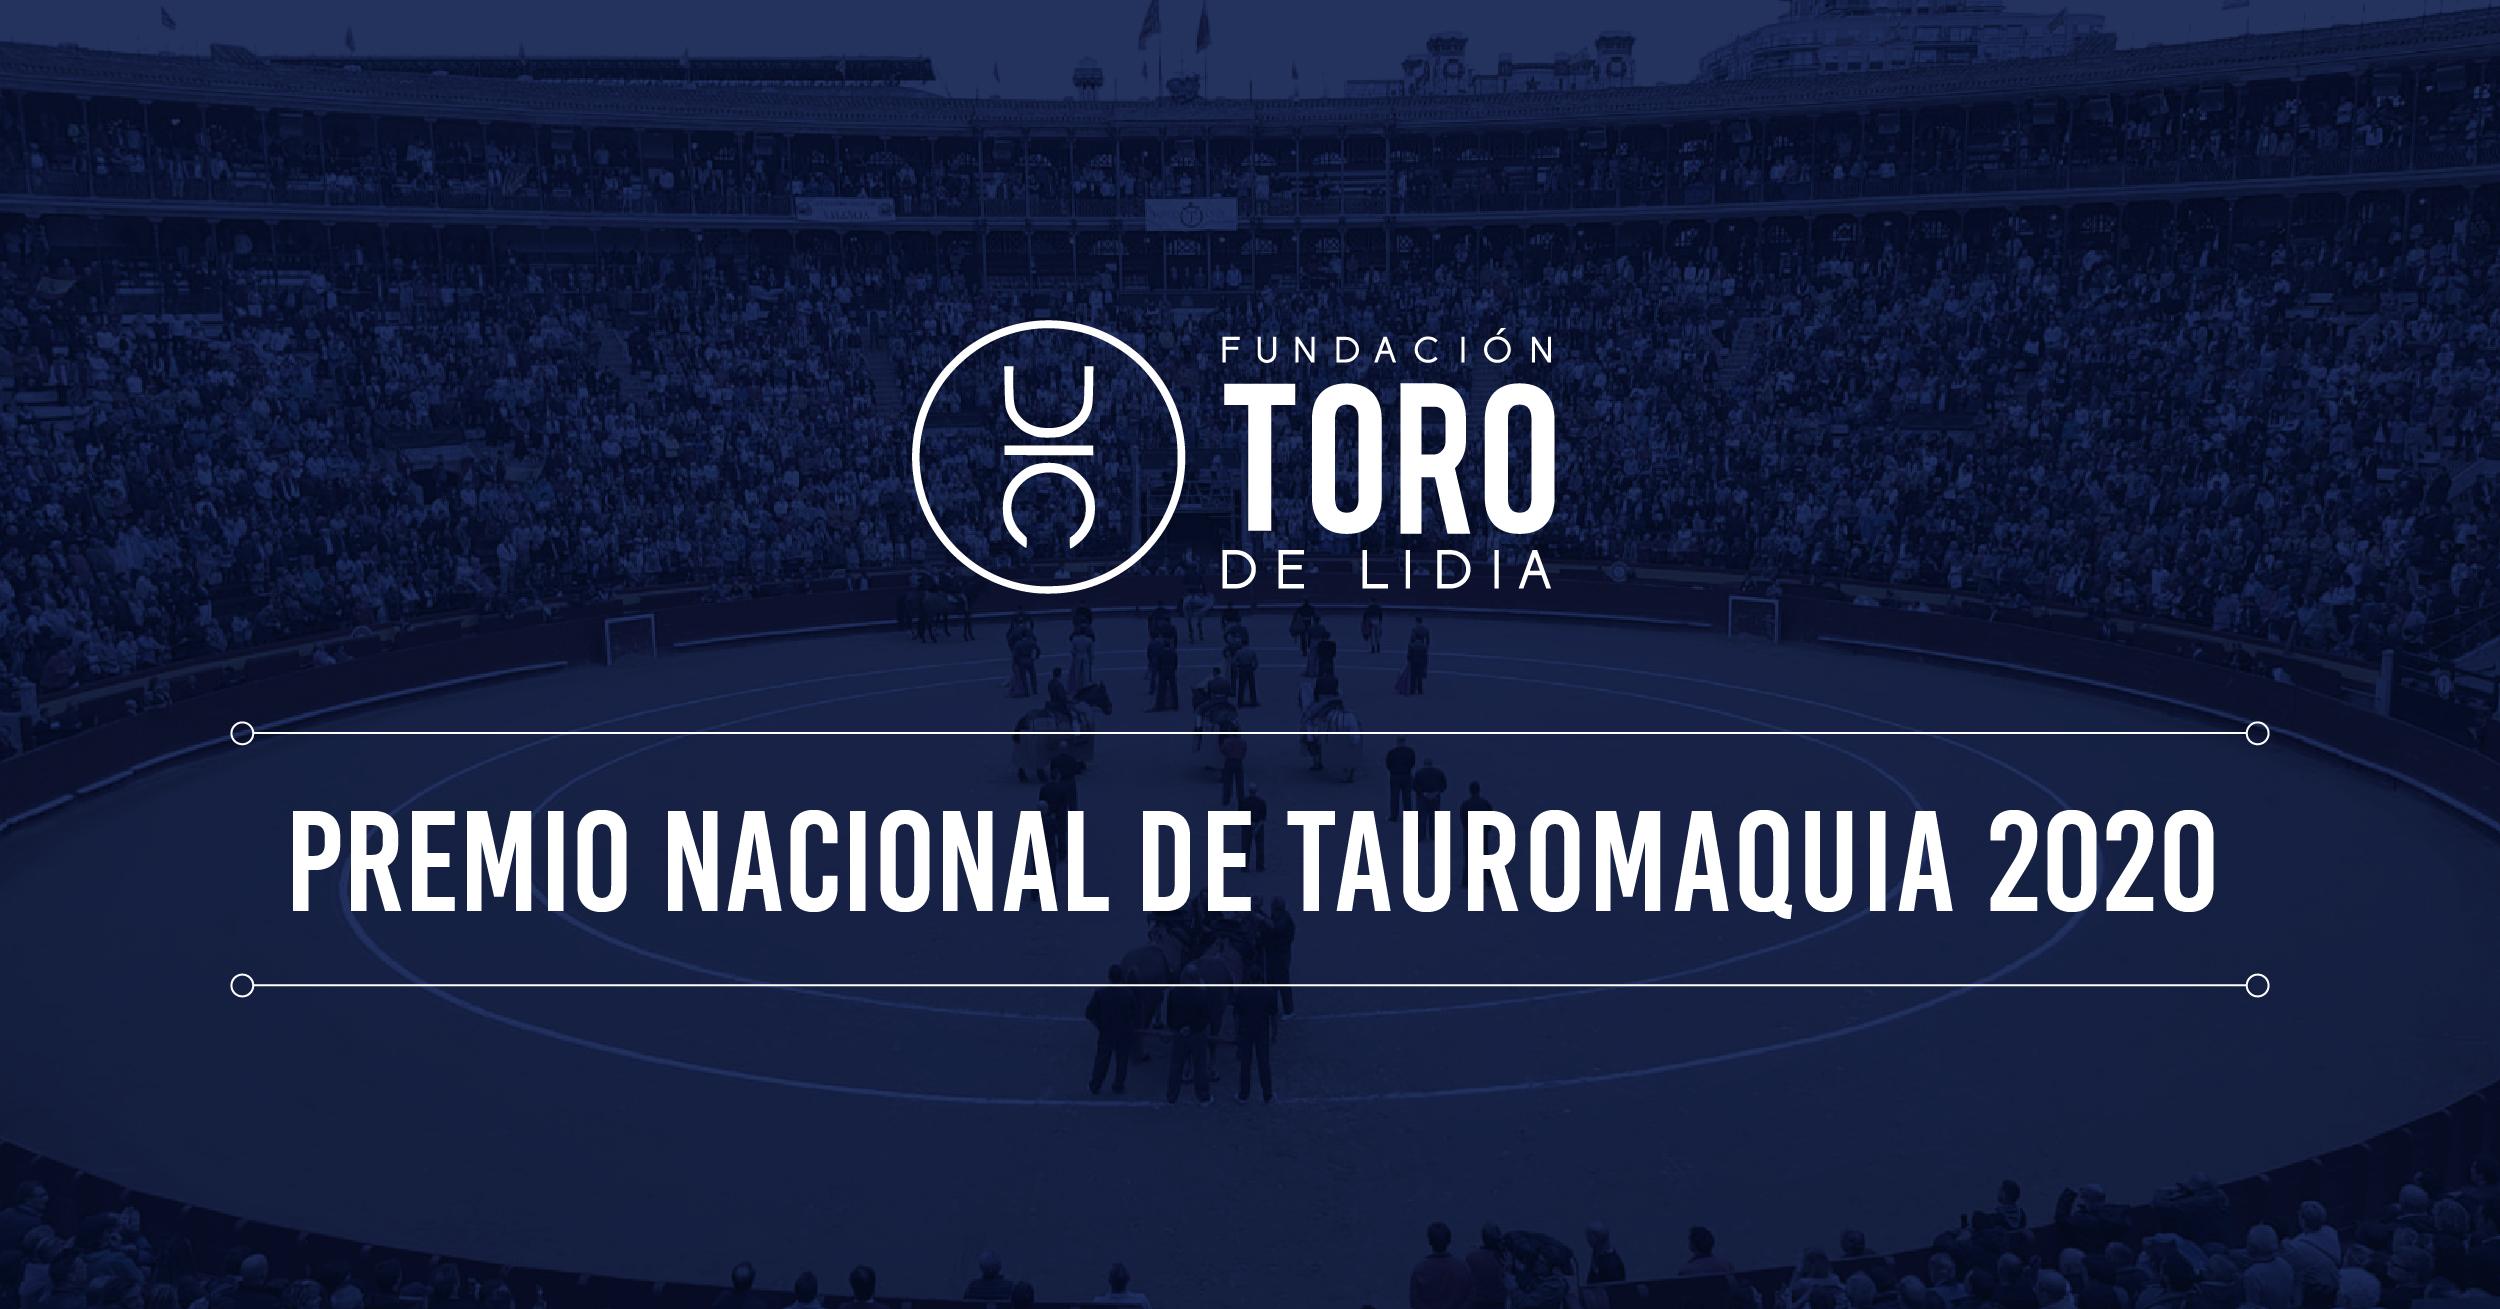 La Fundación Toro de Lidia, Premio Nacional de Tauromaquia 2020